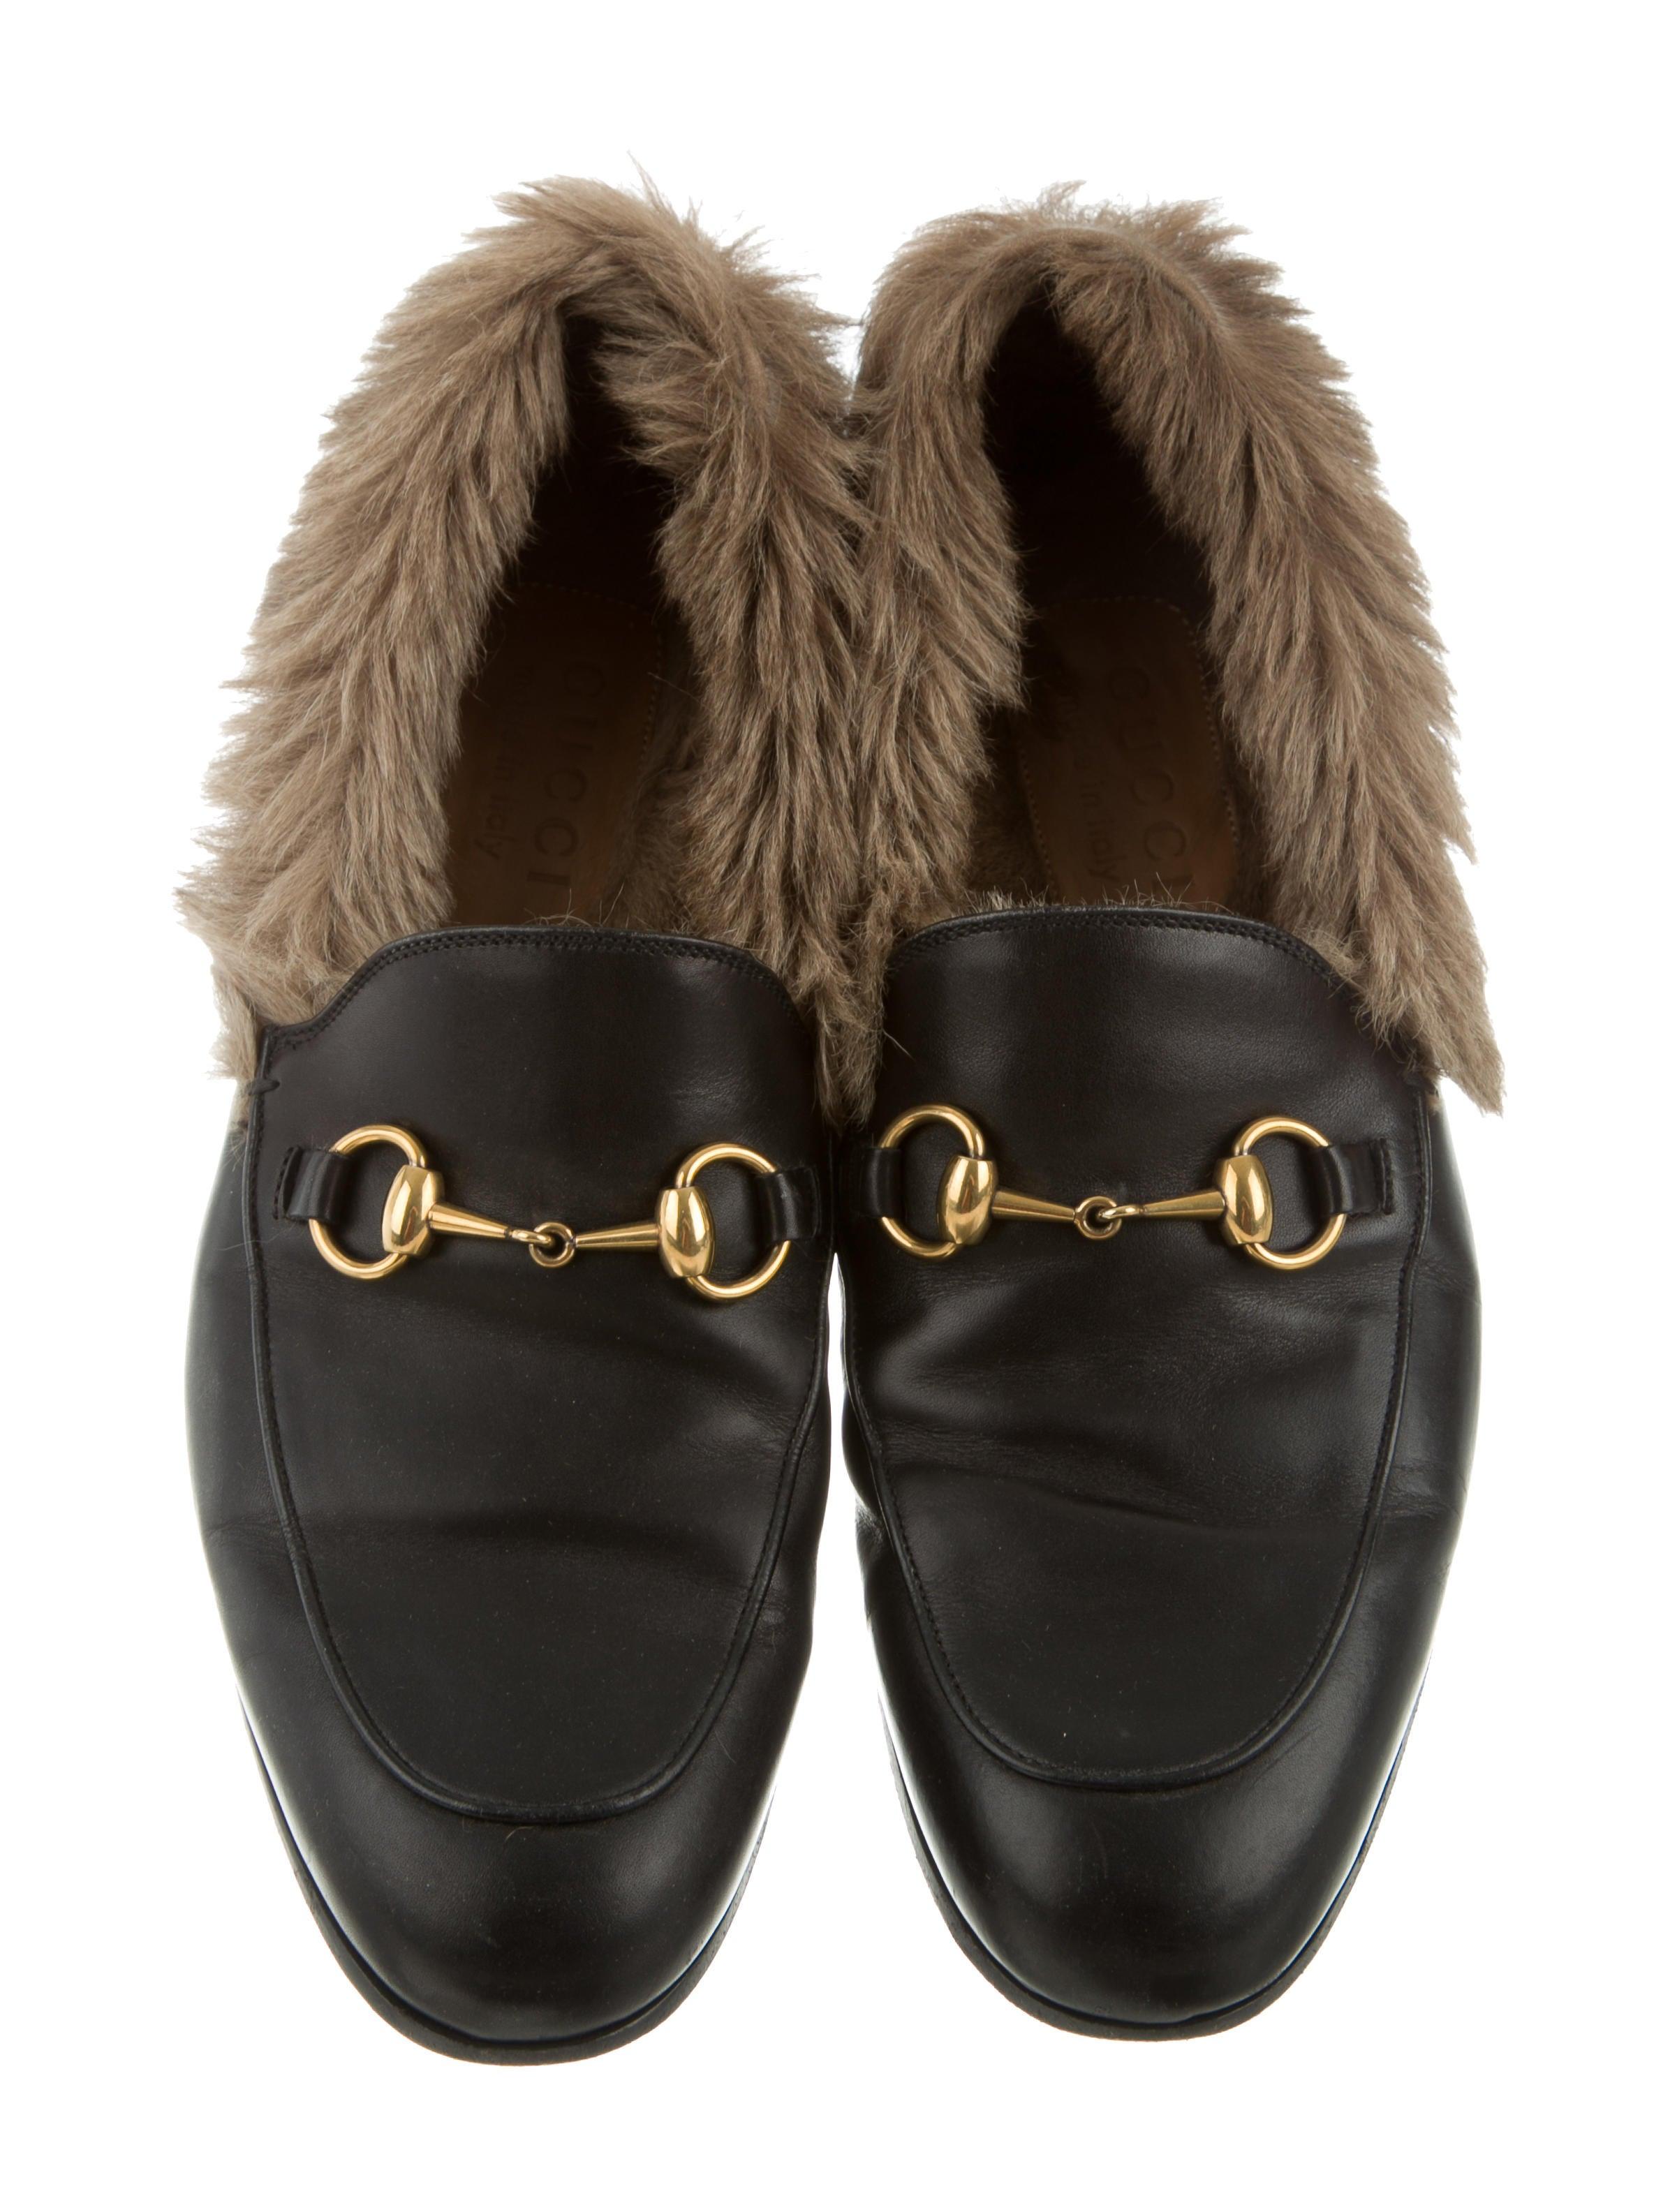 96f367cb378 Gucci Sneaker With Fur - Ontario Active School Travel